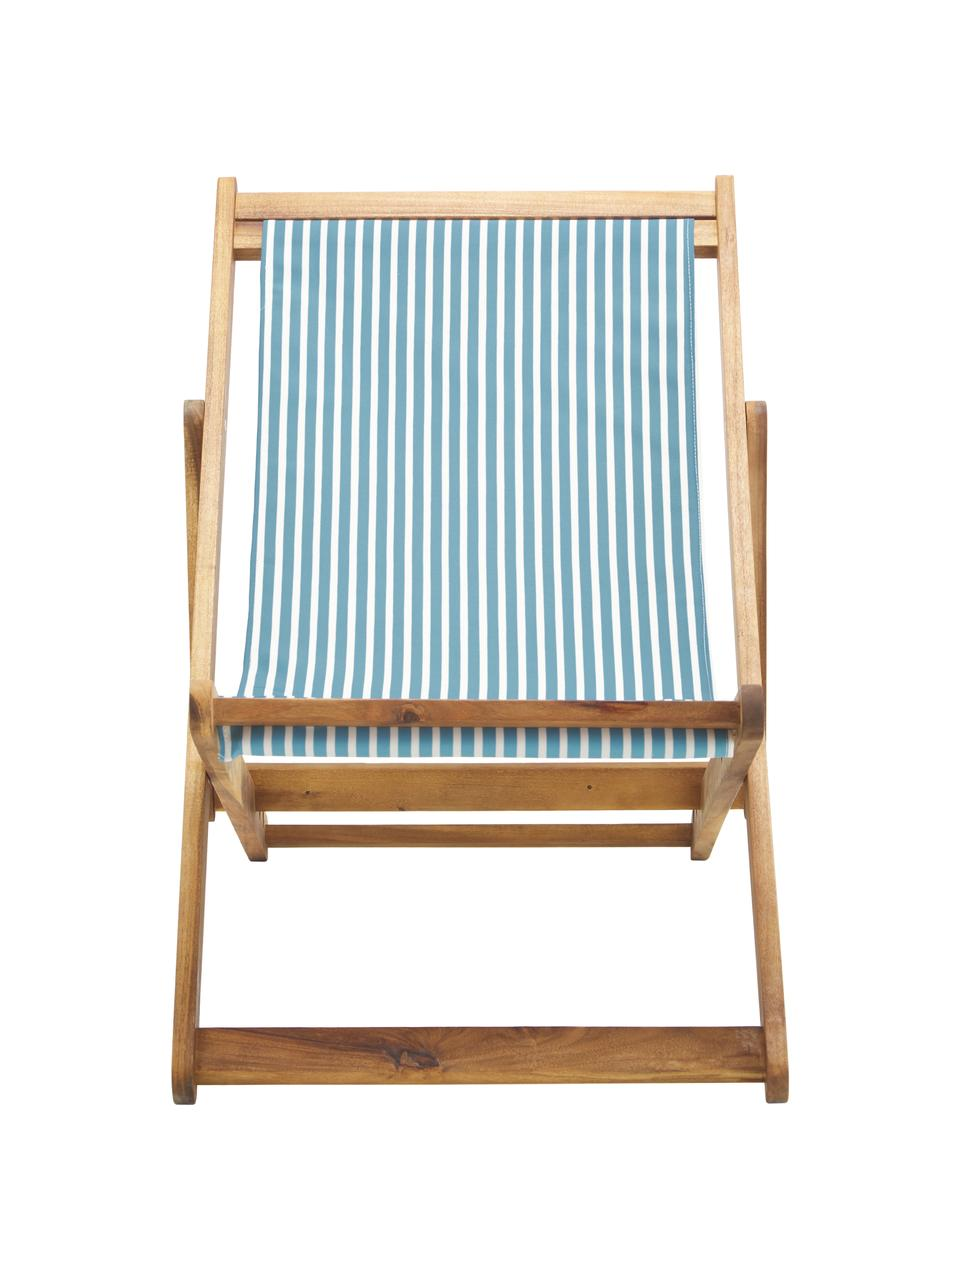 Klappbarer Liegestuhl Zoe, Gestell: Massives Akazienholz, geö, Weiß,Blau, B 59 x T 84 cm